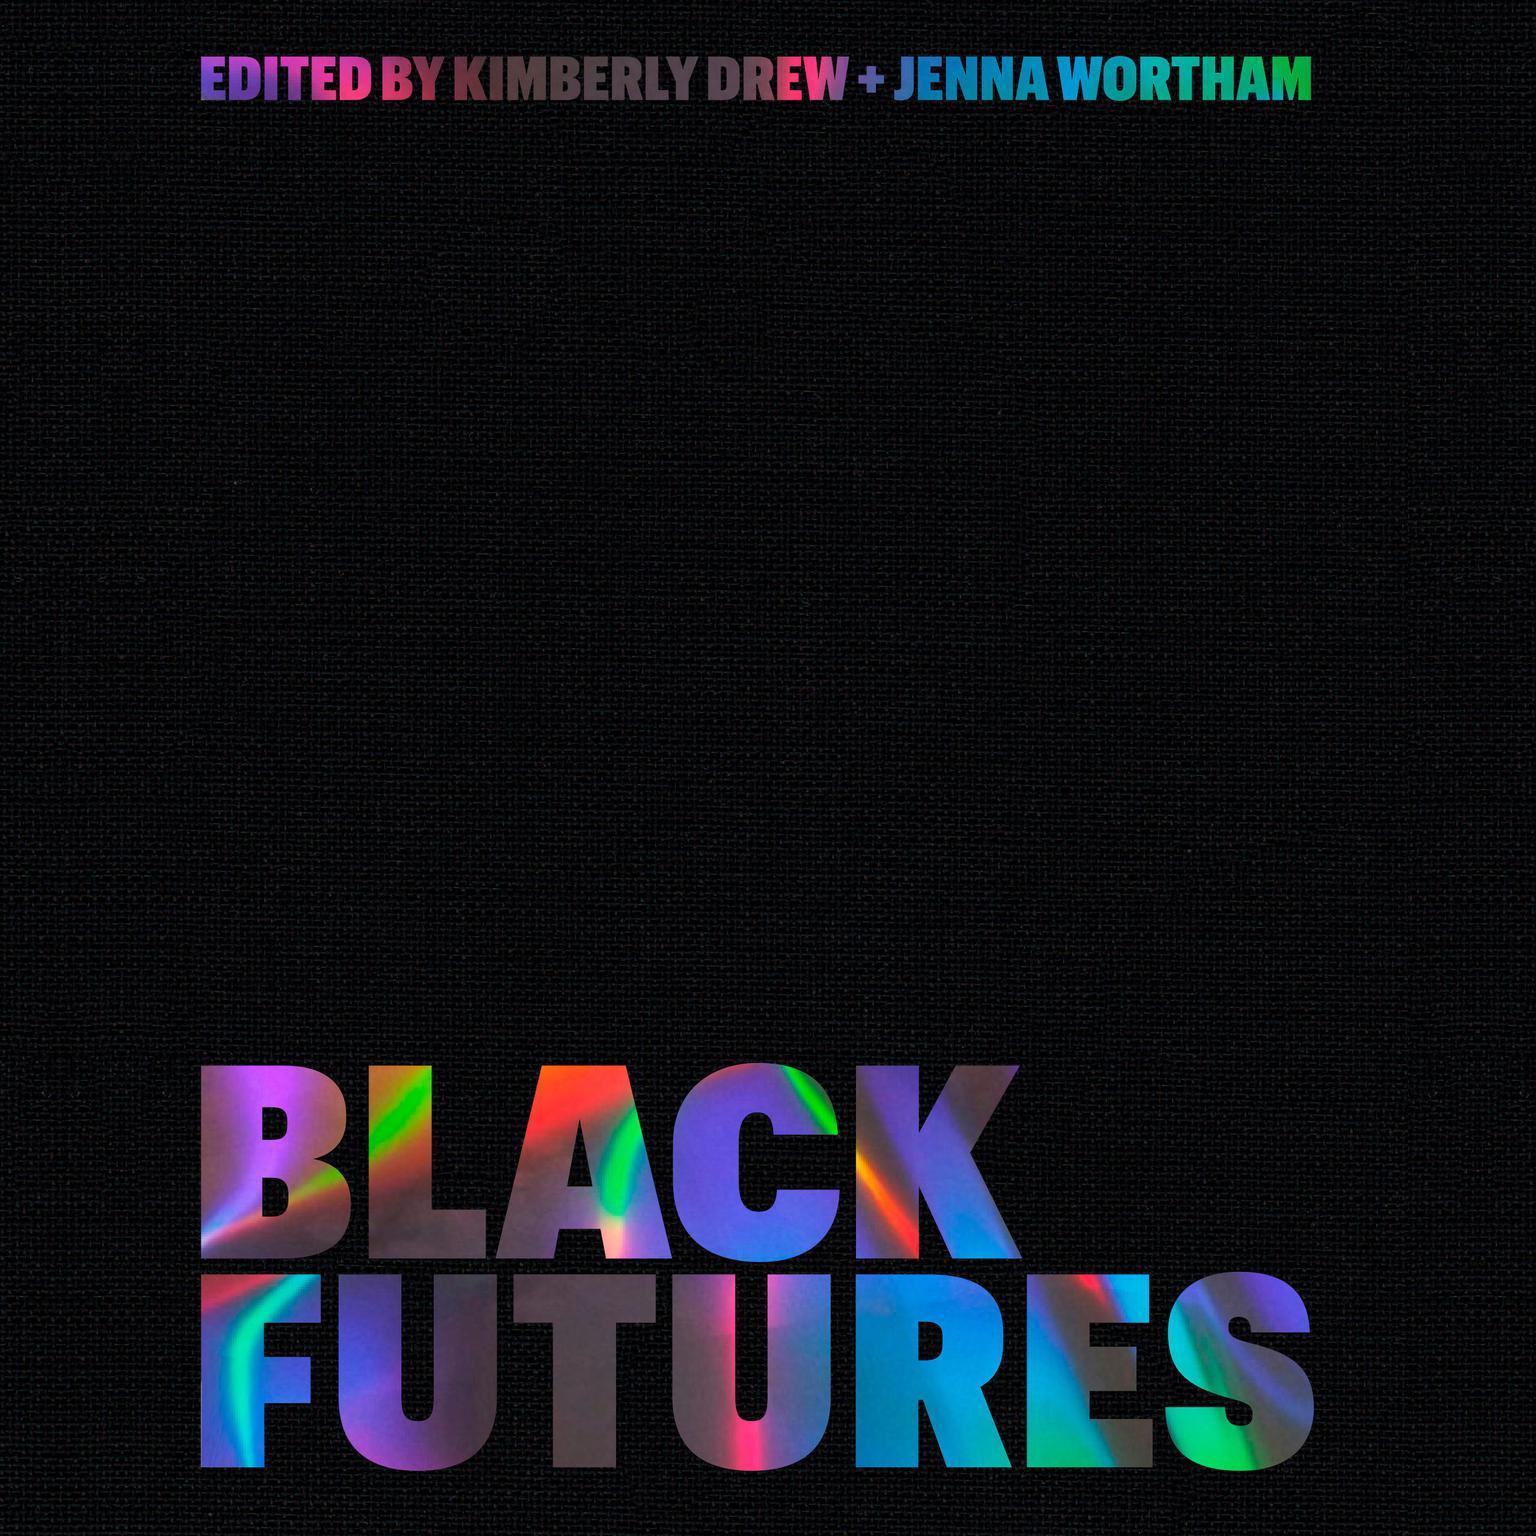 Black Futures Audiobook, by Jenna Wortham